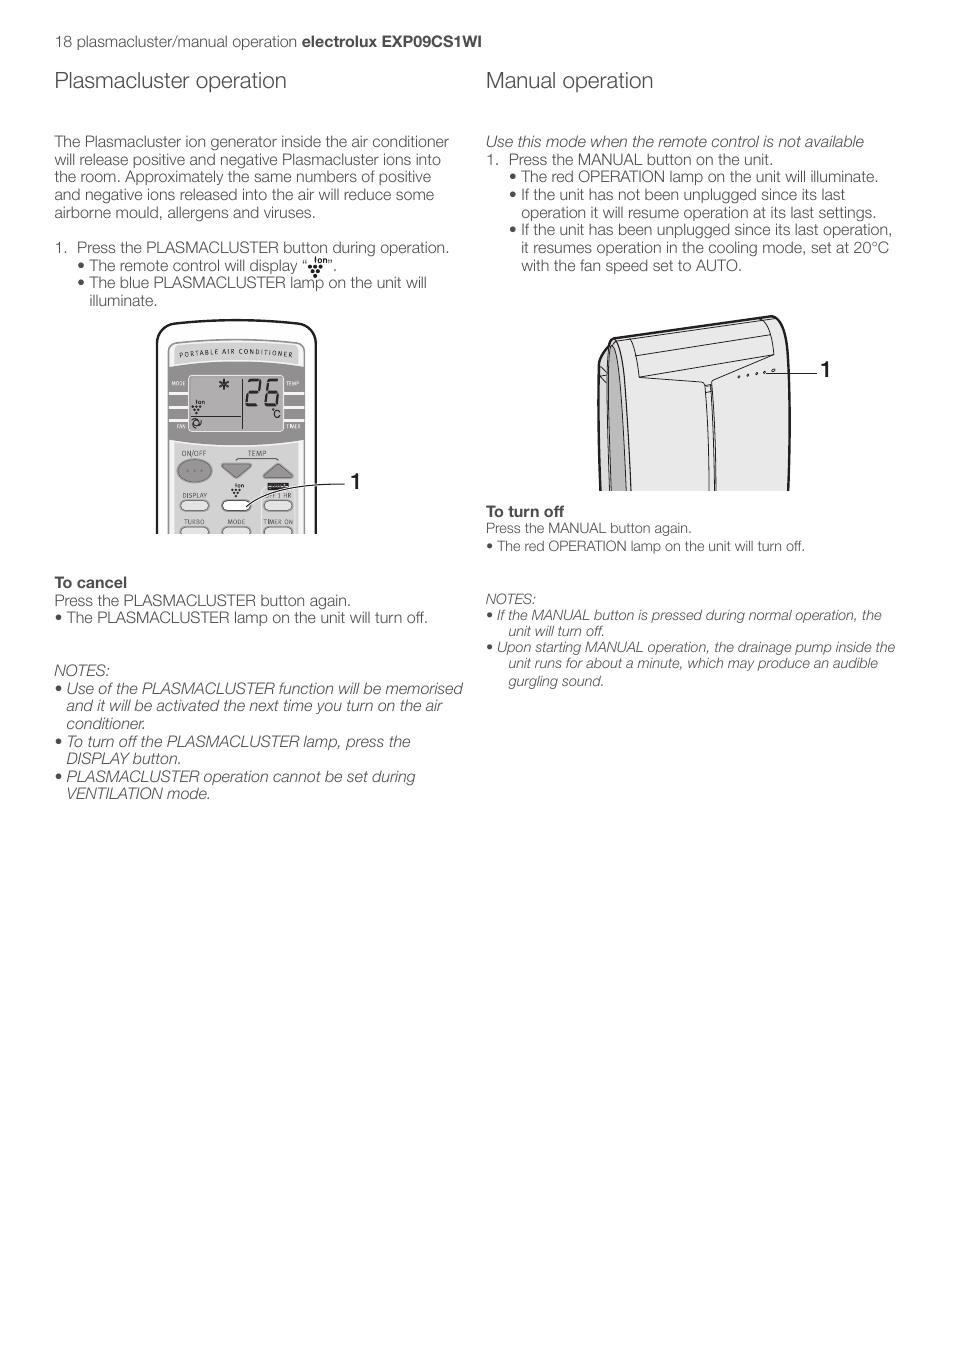 plasmacluster operation manual operation electrolux u31175 lu4 rh manualsdir com Home Depot Portable Generators Plug Portable Generator